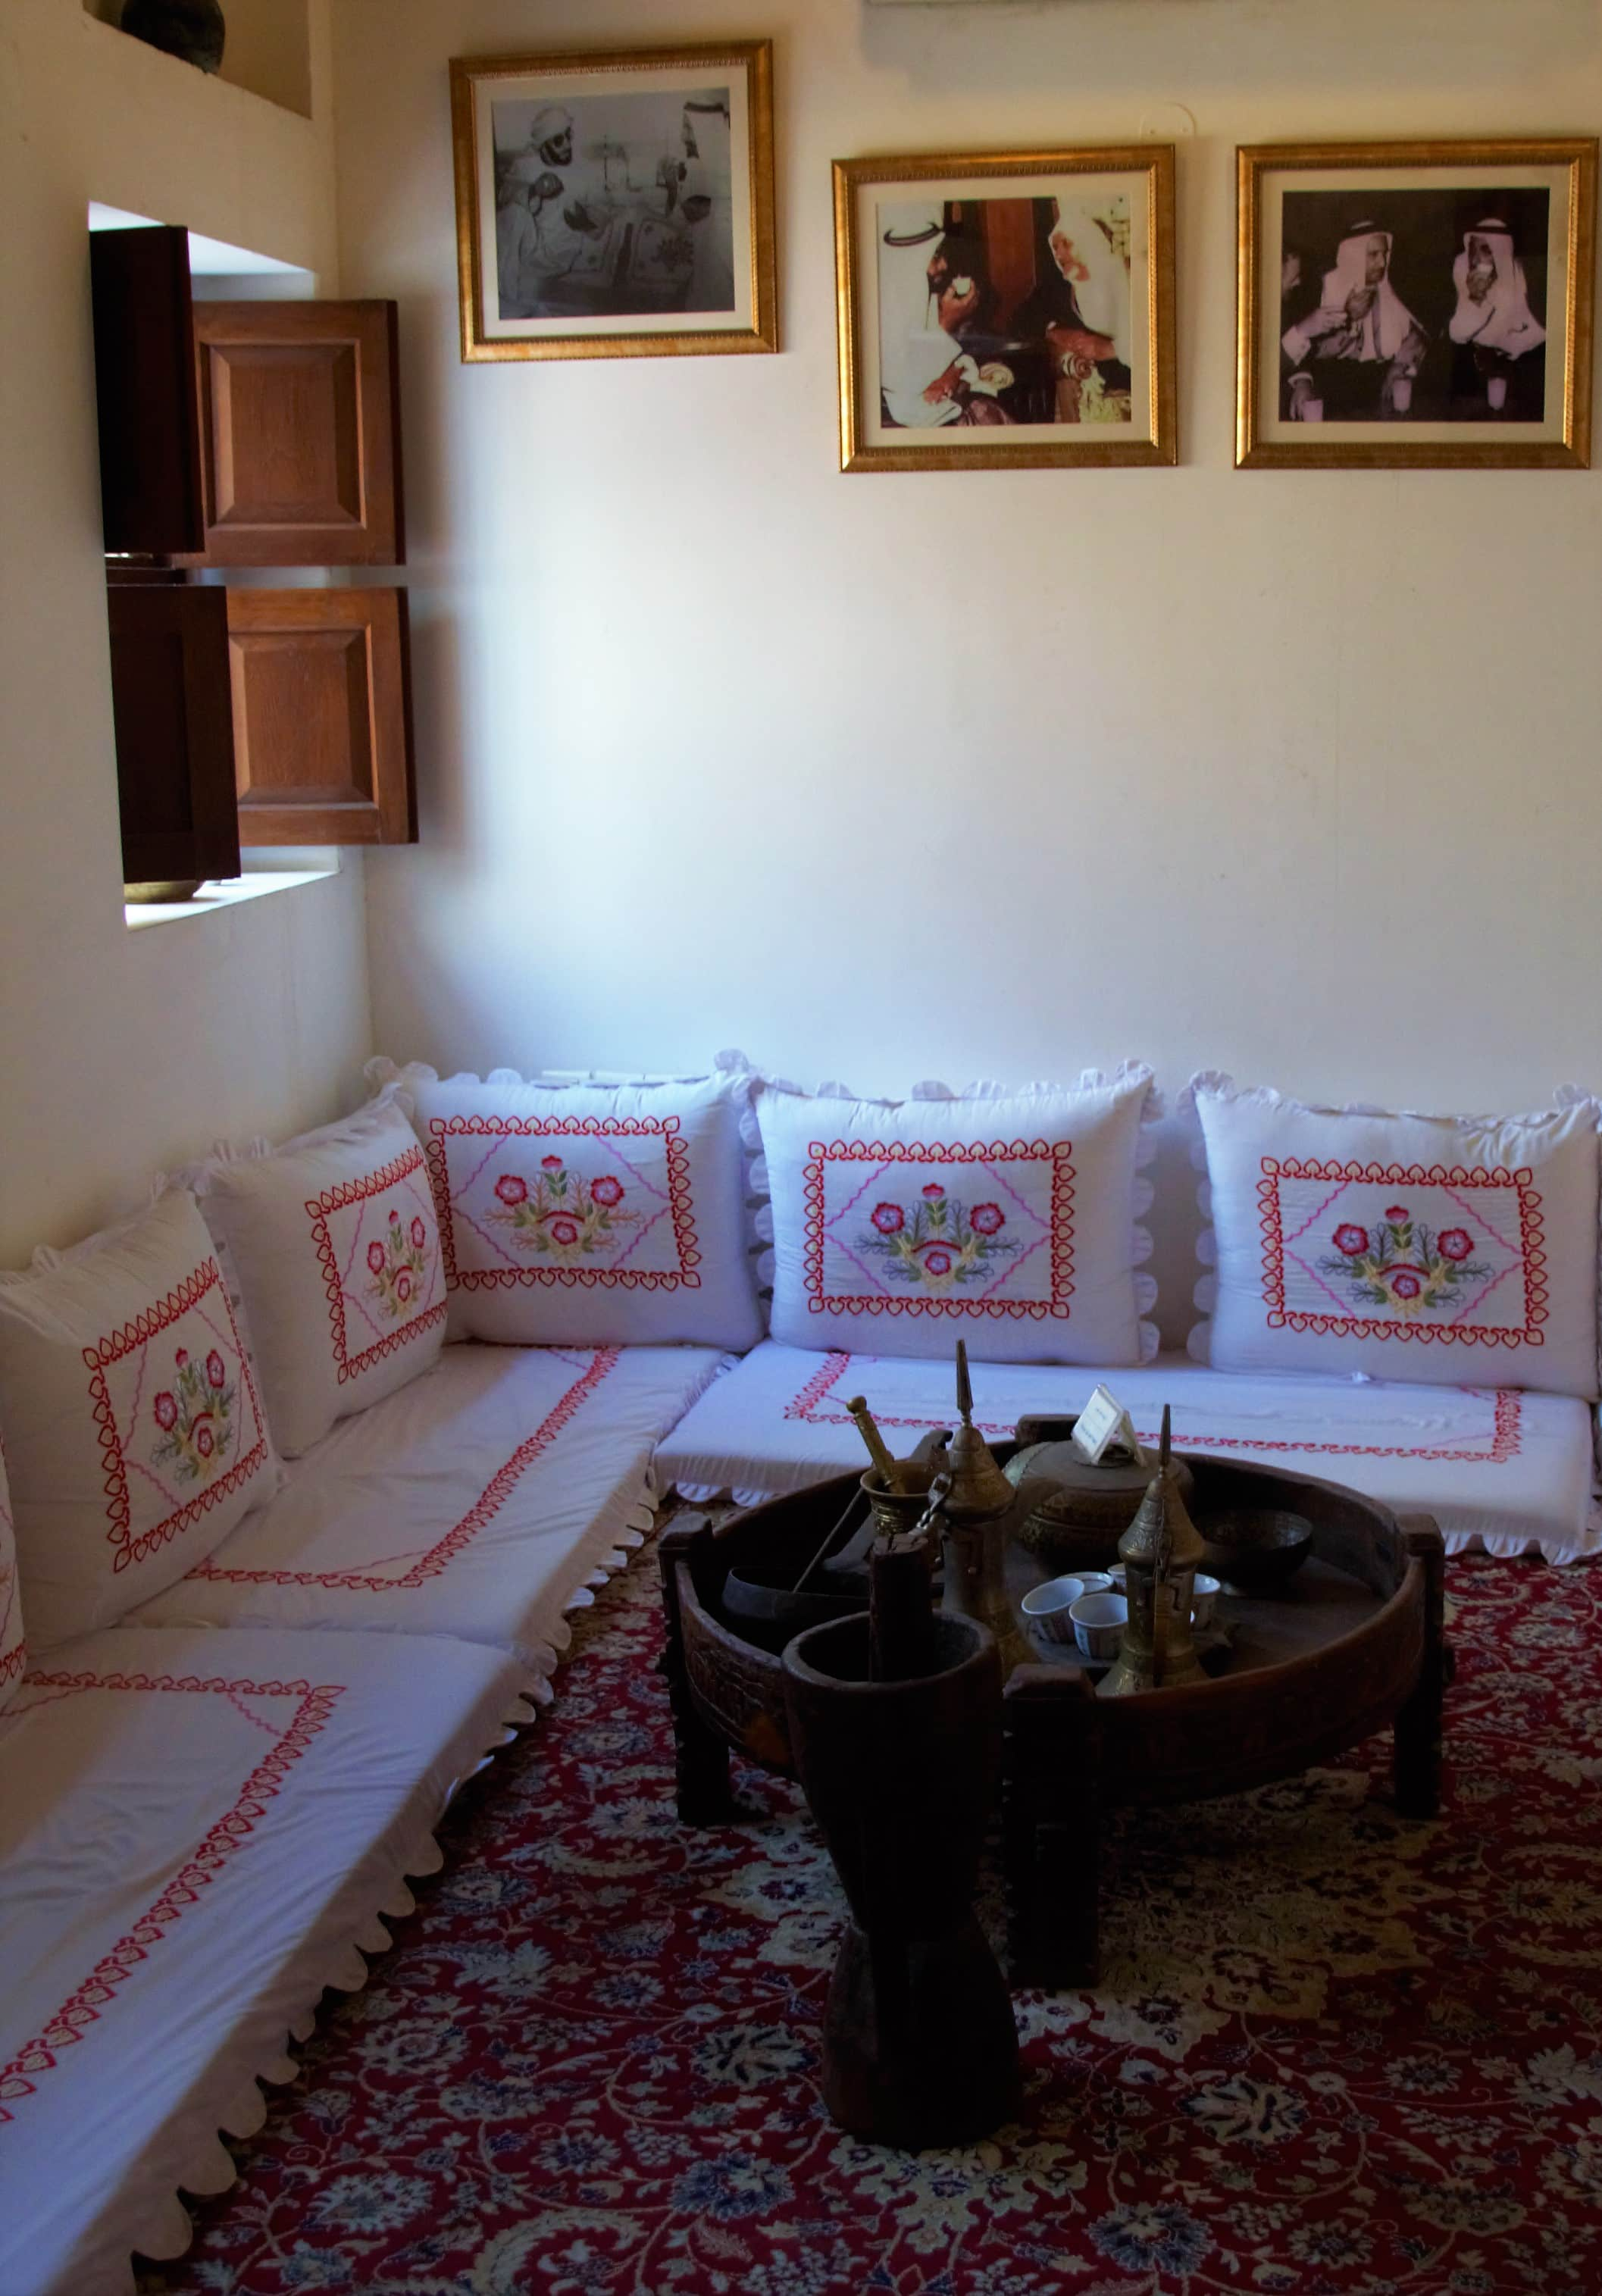 A traditional Arabian coffee service